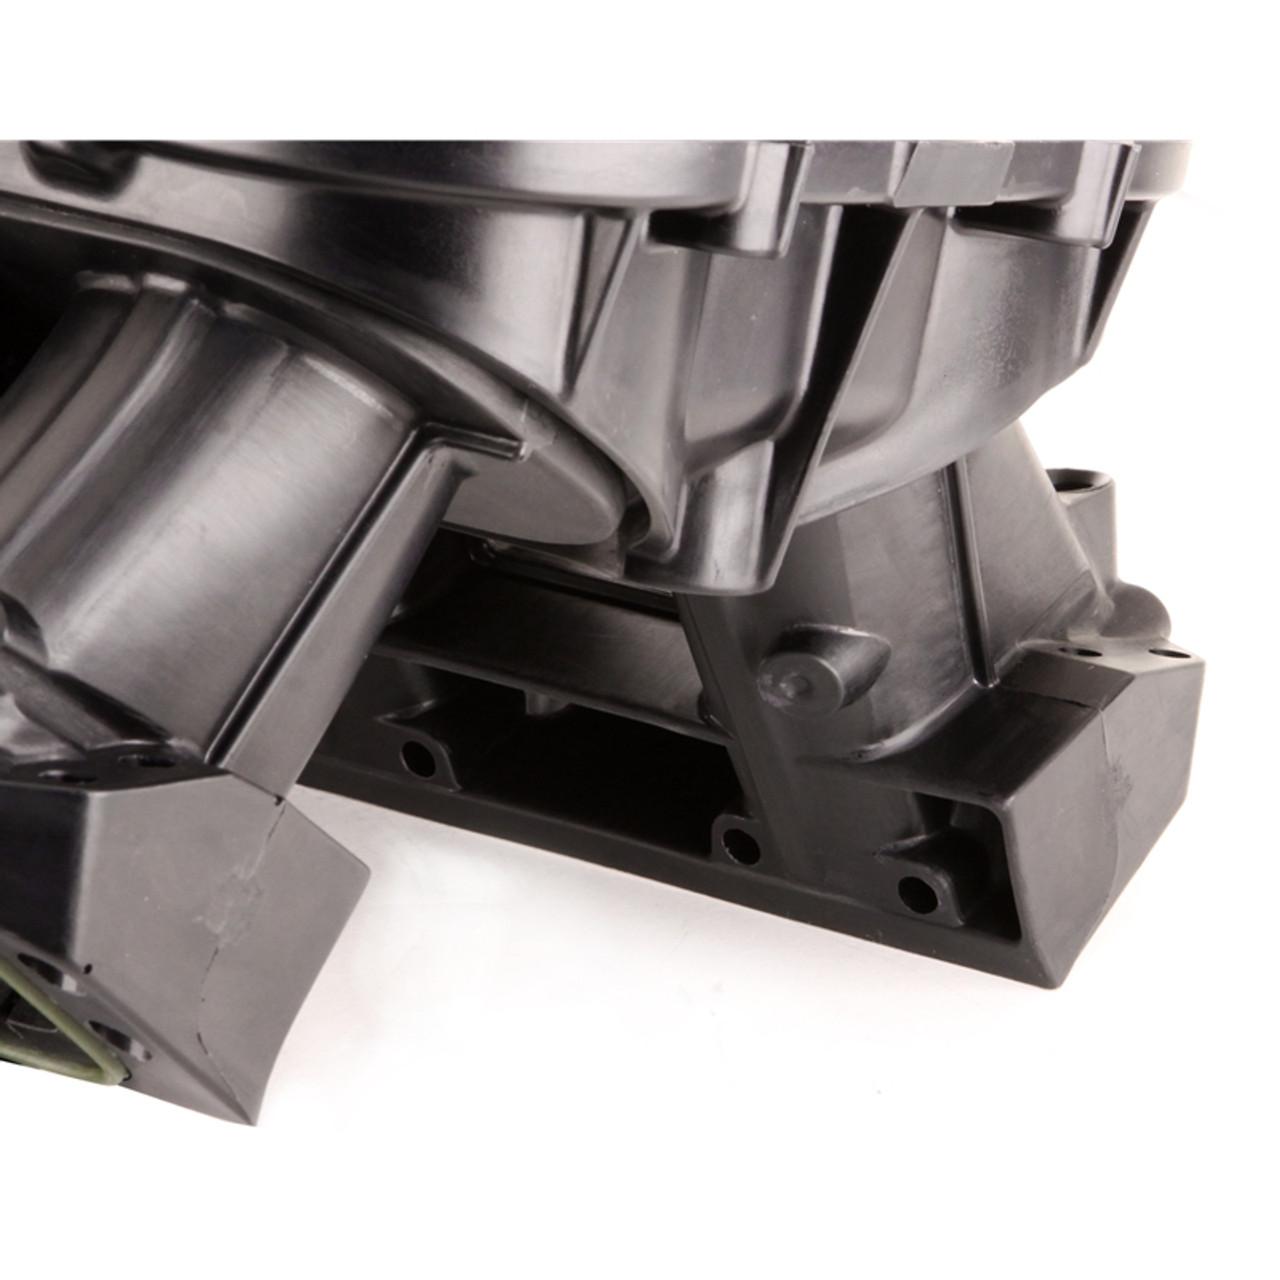 Performance Design Carbon pTR Intake Manifold | LS3 Port